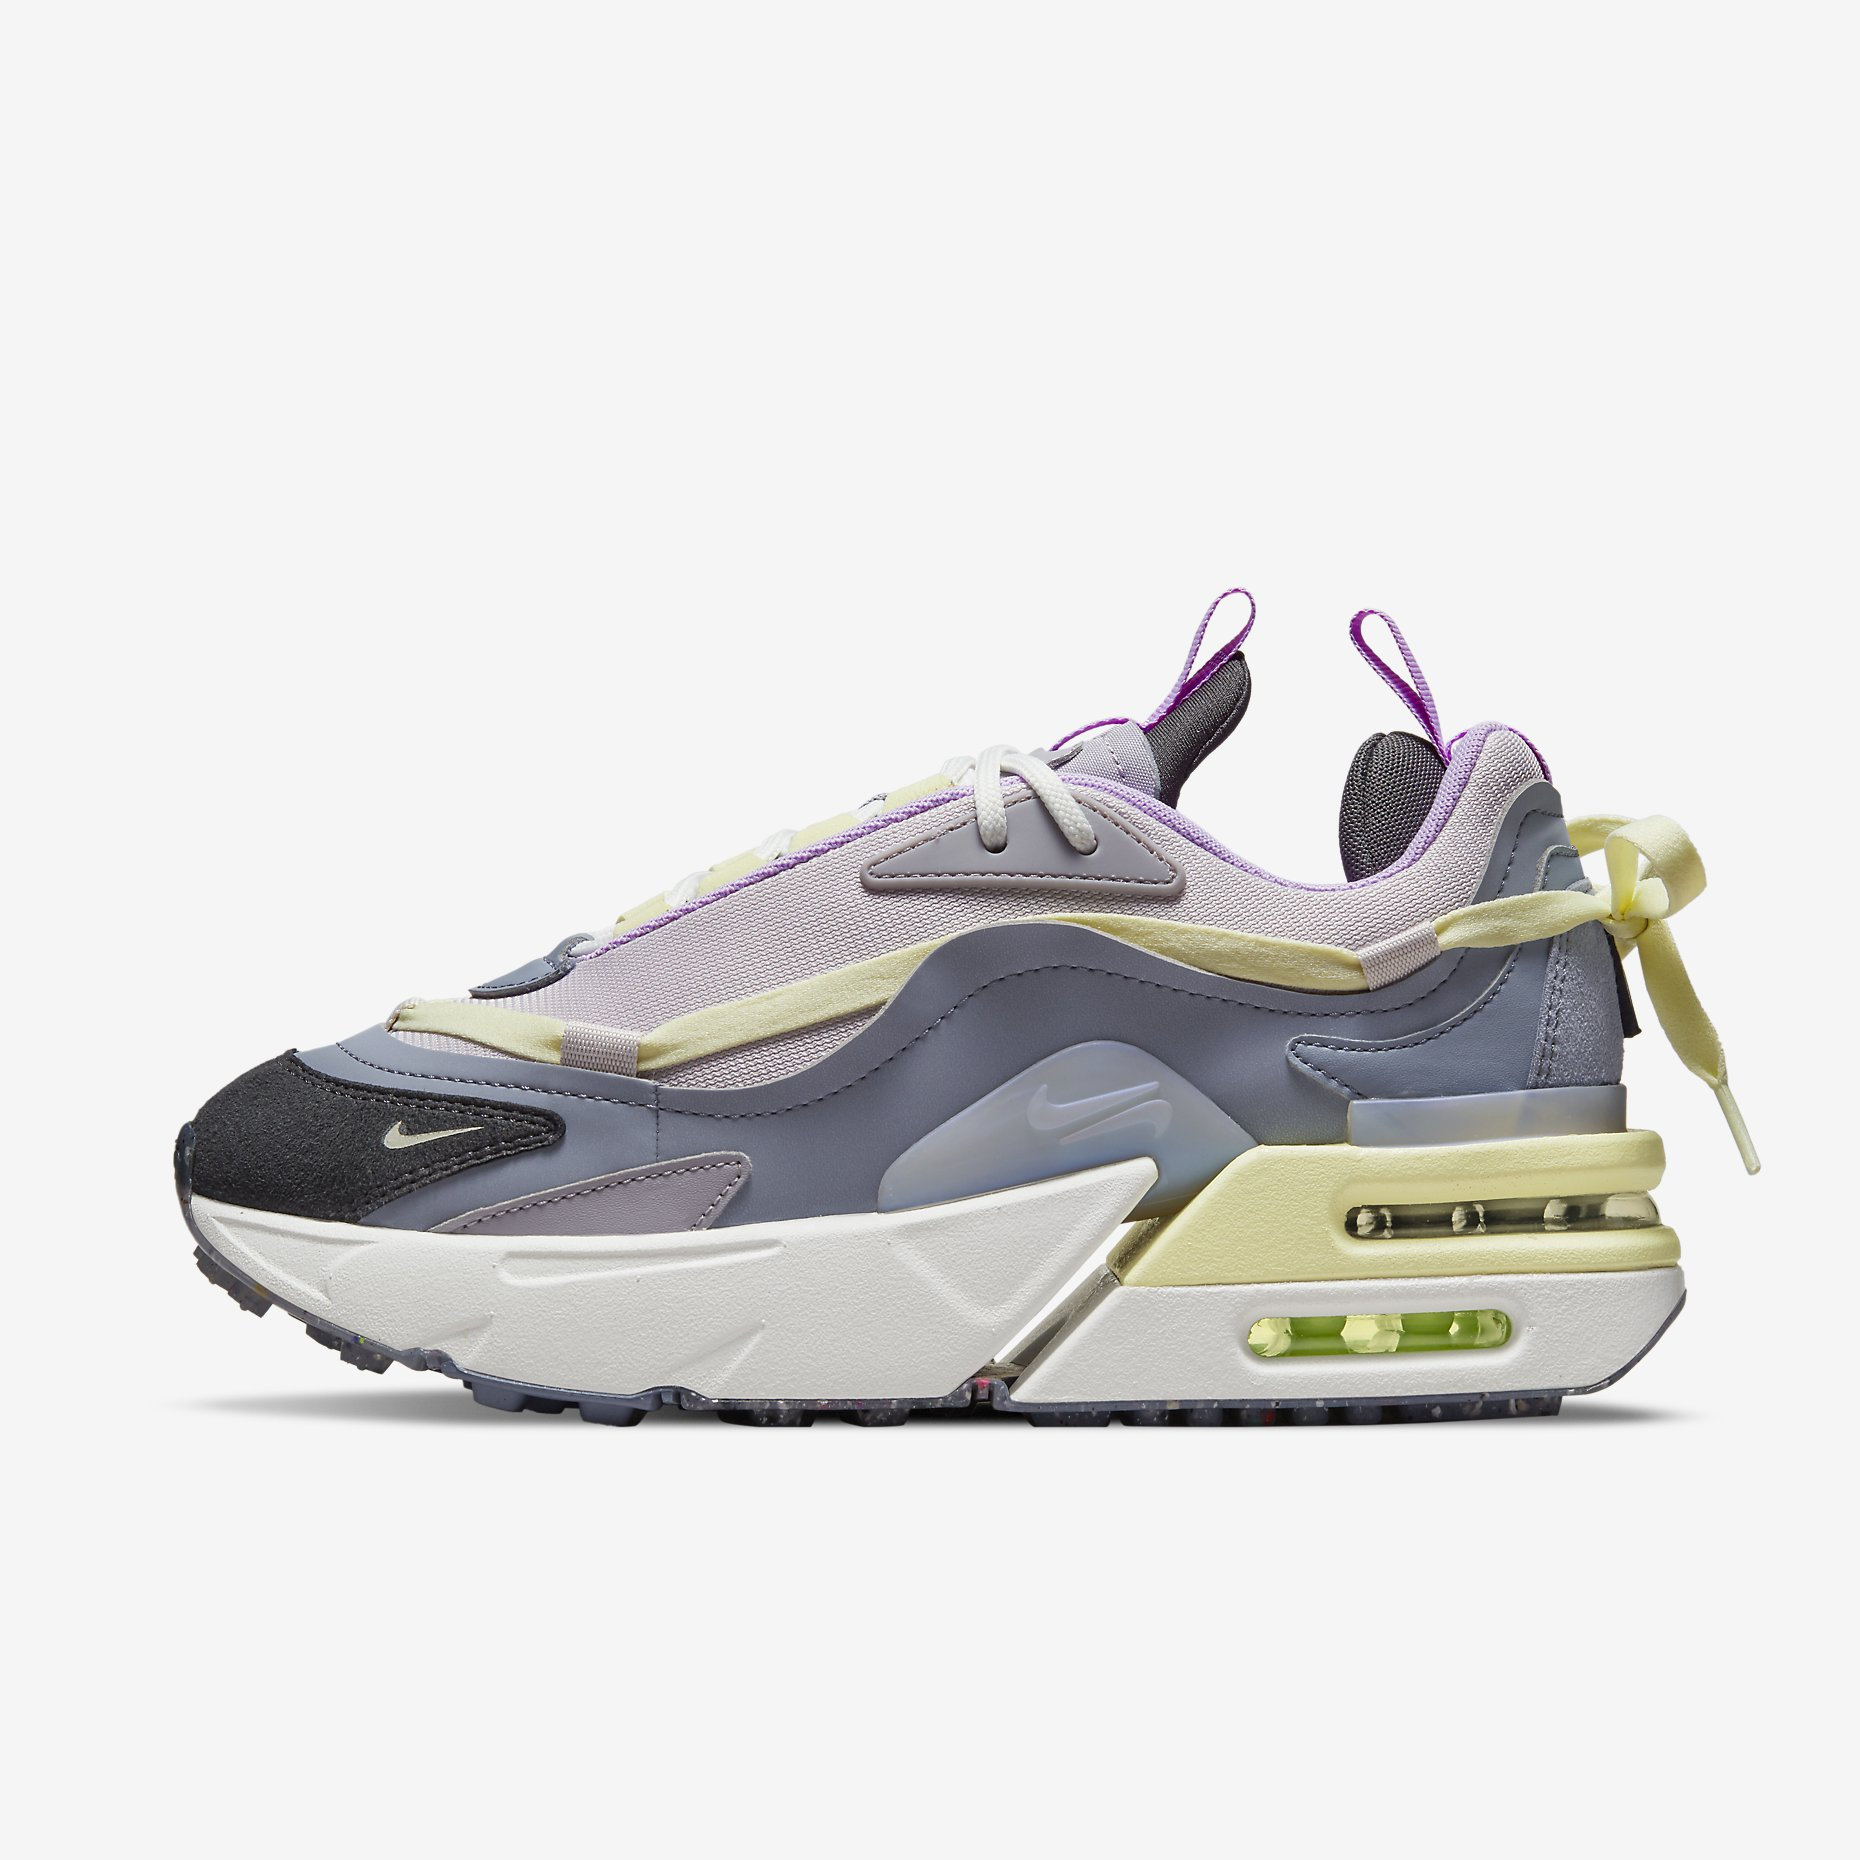 Women's Nike Air Max Furyosa 'Ashen Slate'